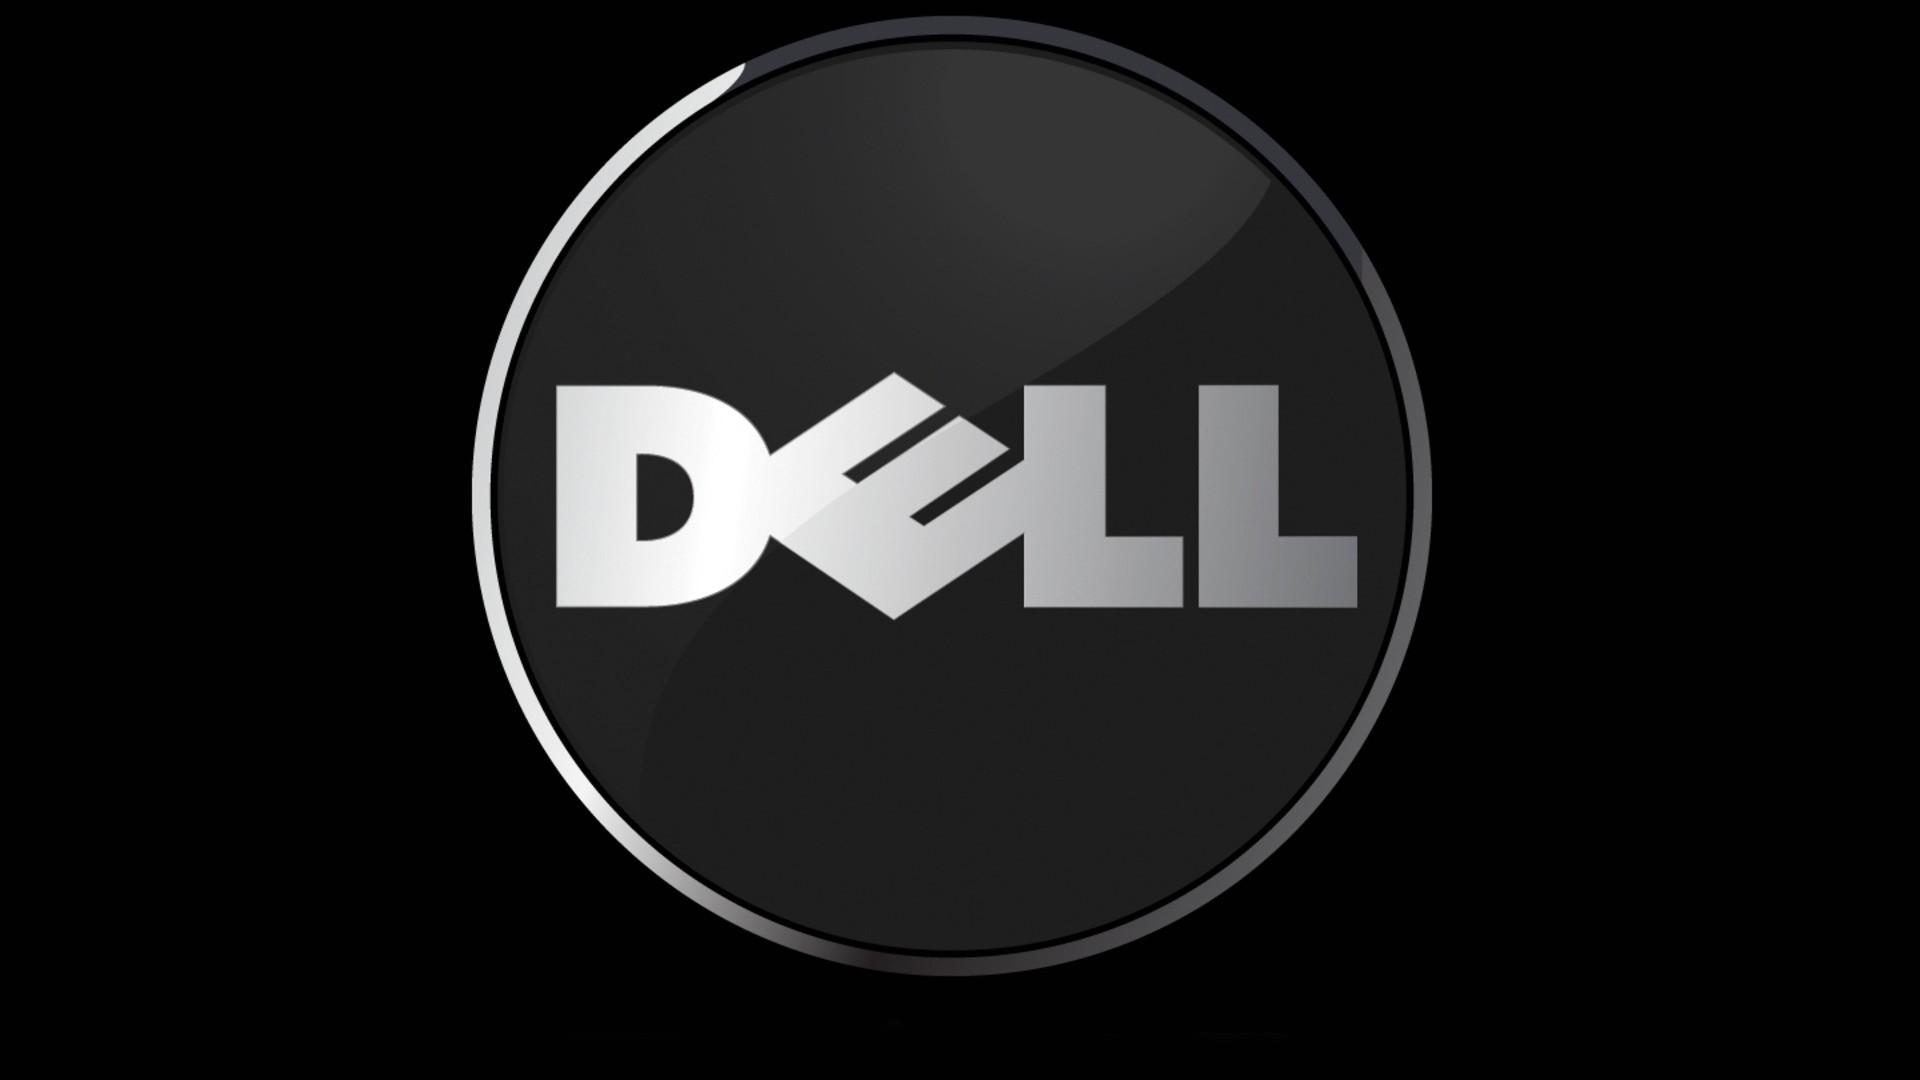 dell logo font download